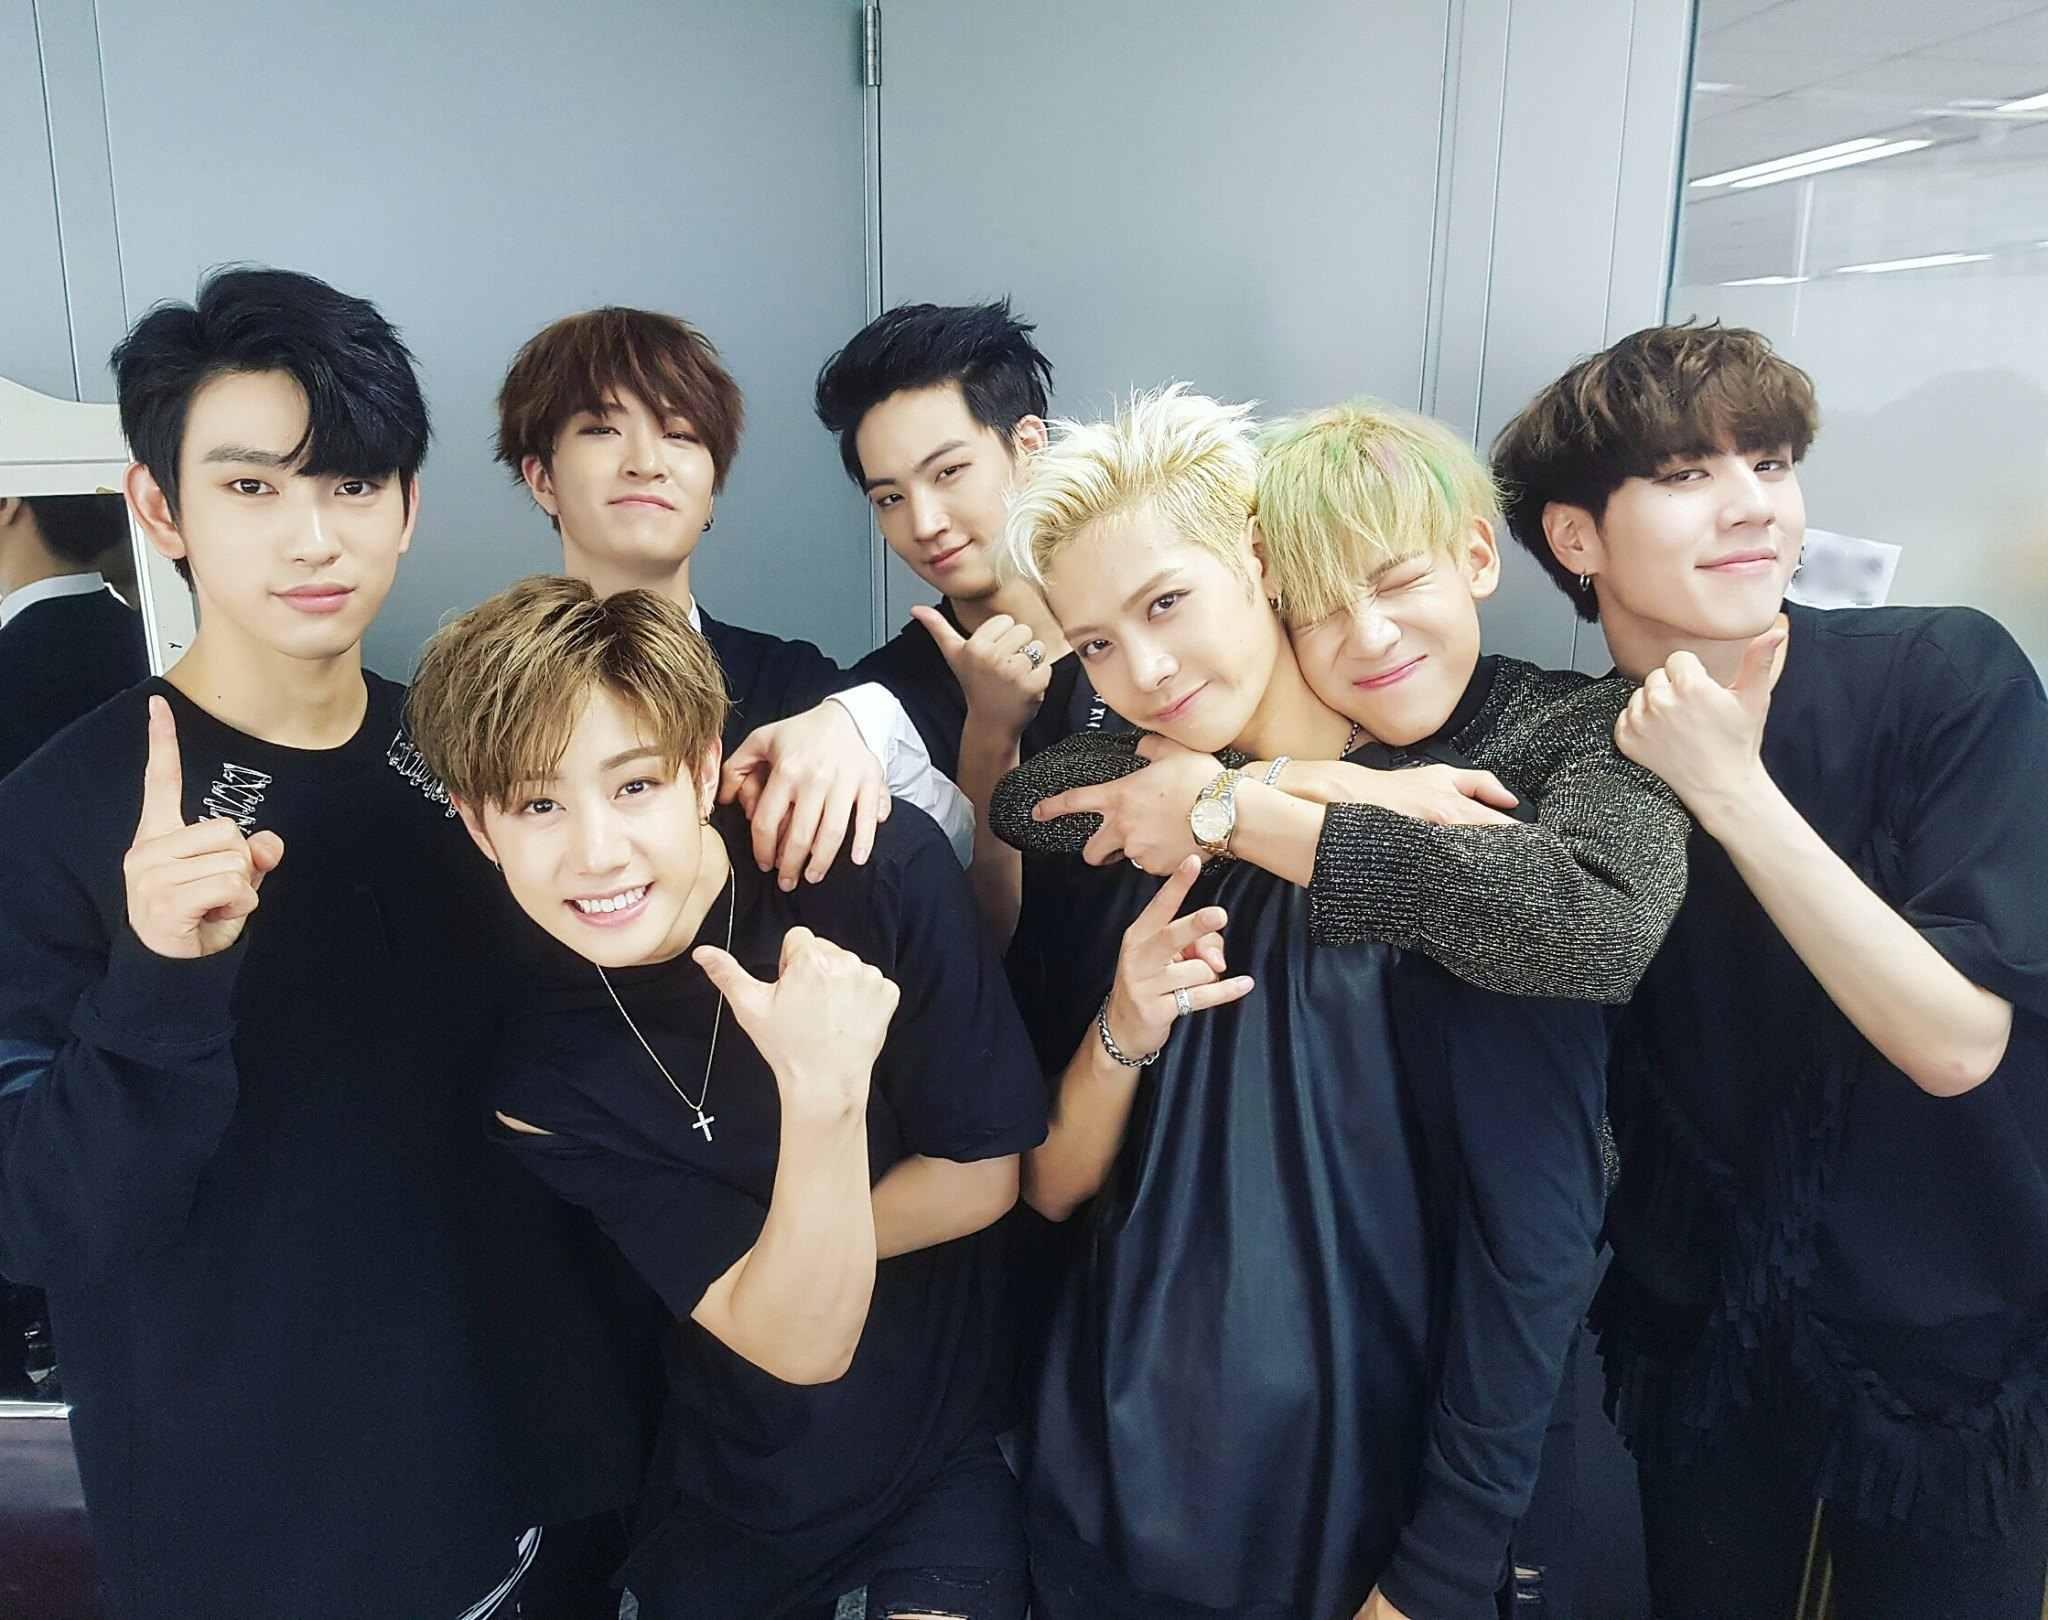 GOT7-榮宰 身為14年出道的新人團體,其實GOT7團體能有這樣的成績已經算是不錯的表現,不過大眾也可以很容易感受到他們在韓國各別成員人氣的差別,像是珍榮、Jackson就是無庸置疑的人氣成員